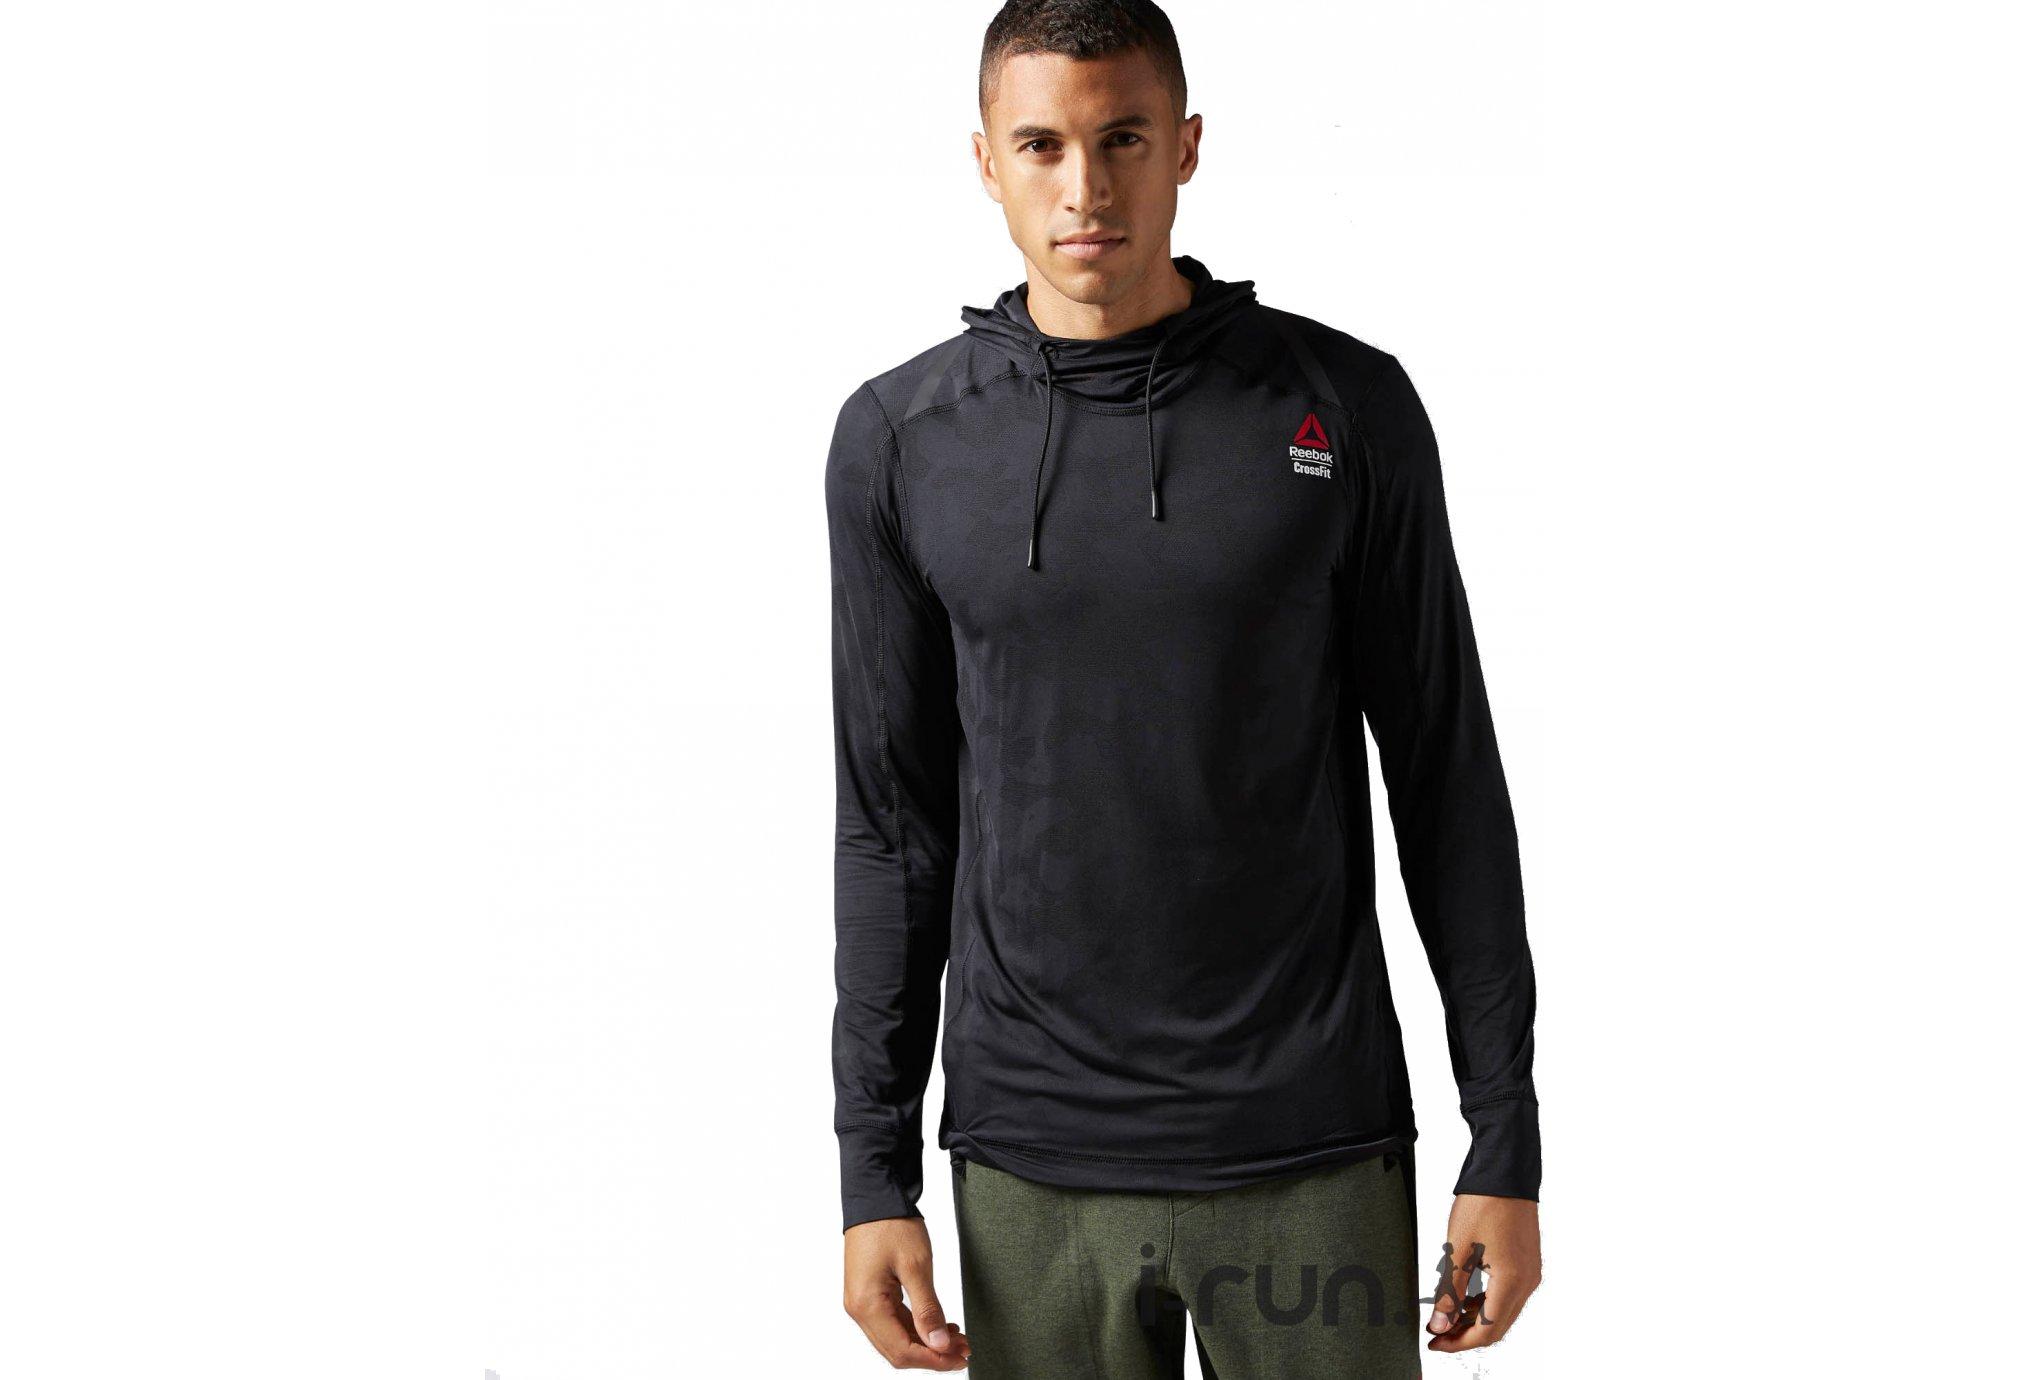 Reebok Crossfit Jacquard M vêtement running homme